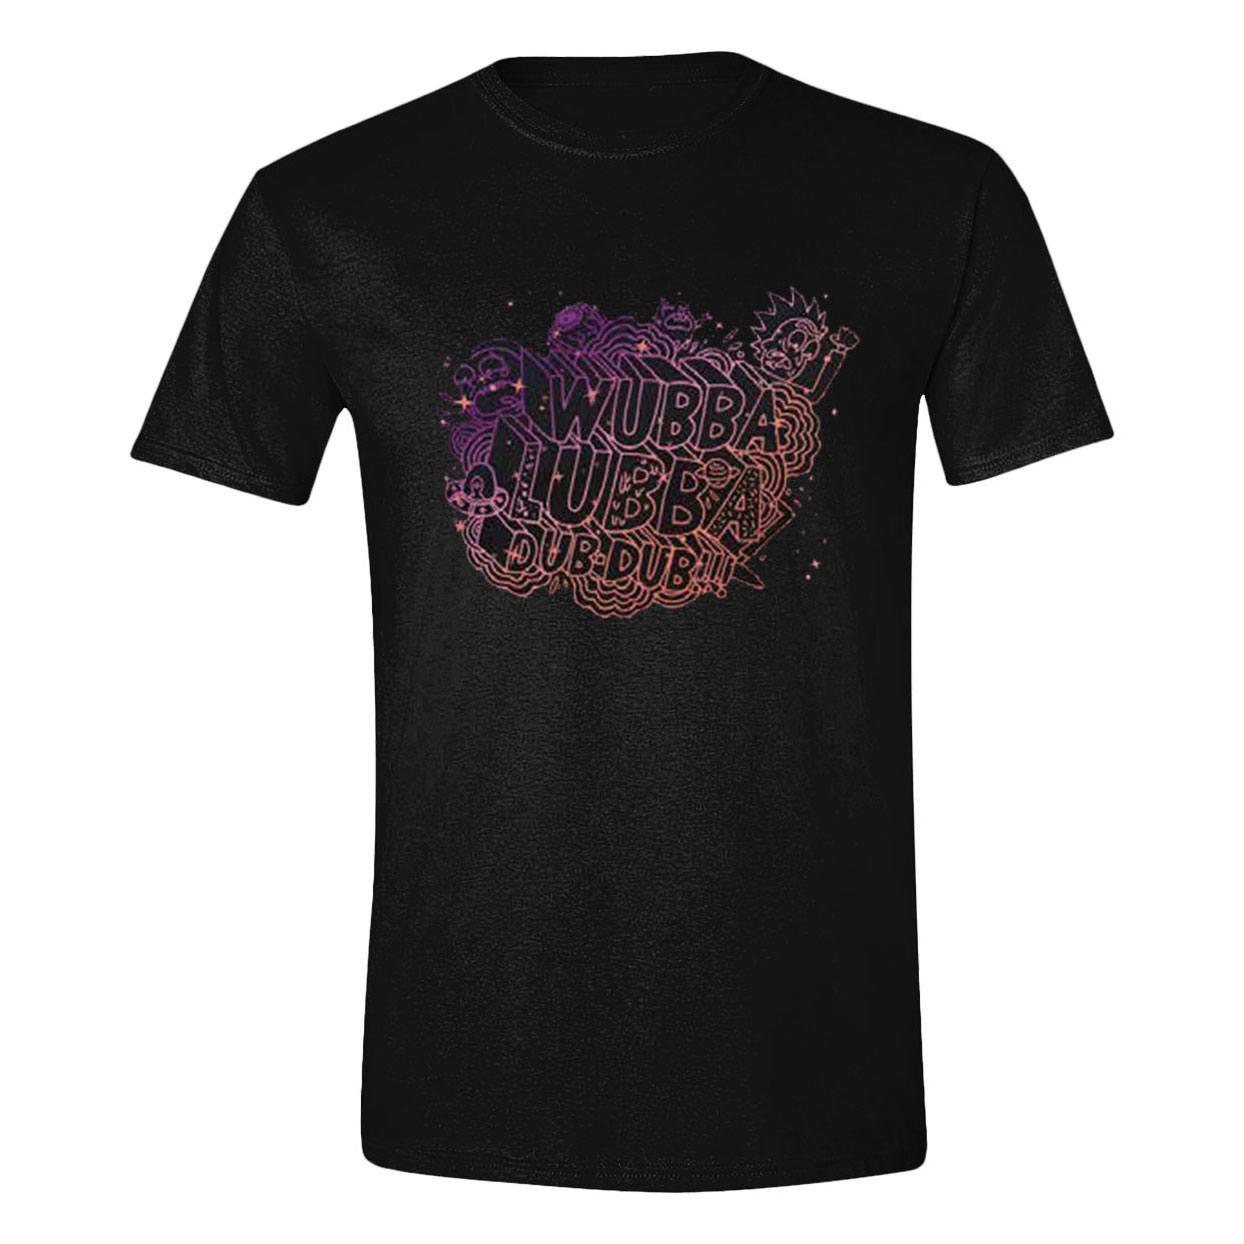 Rick & Morty T-Shirt Wubba Lubba Size XL